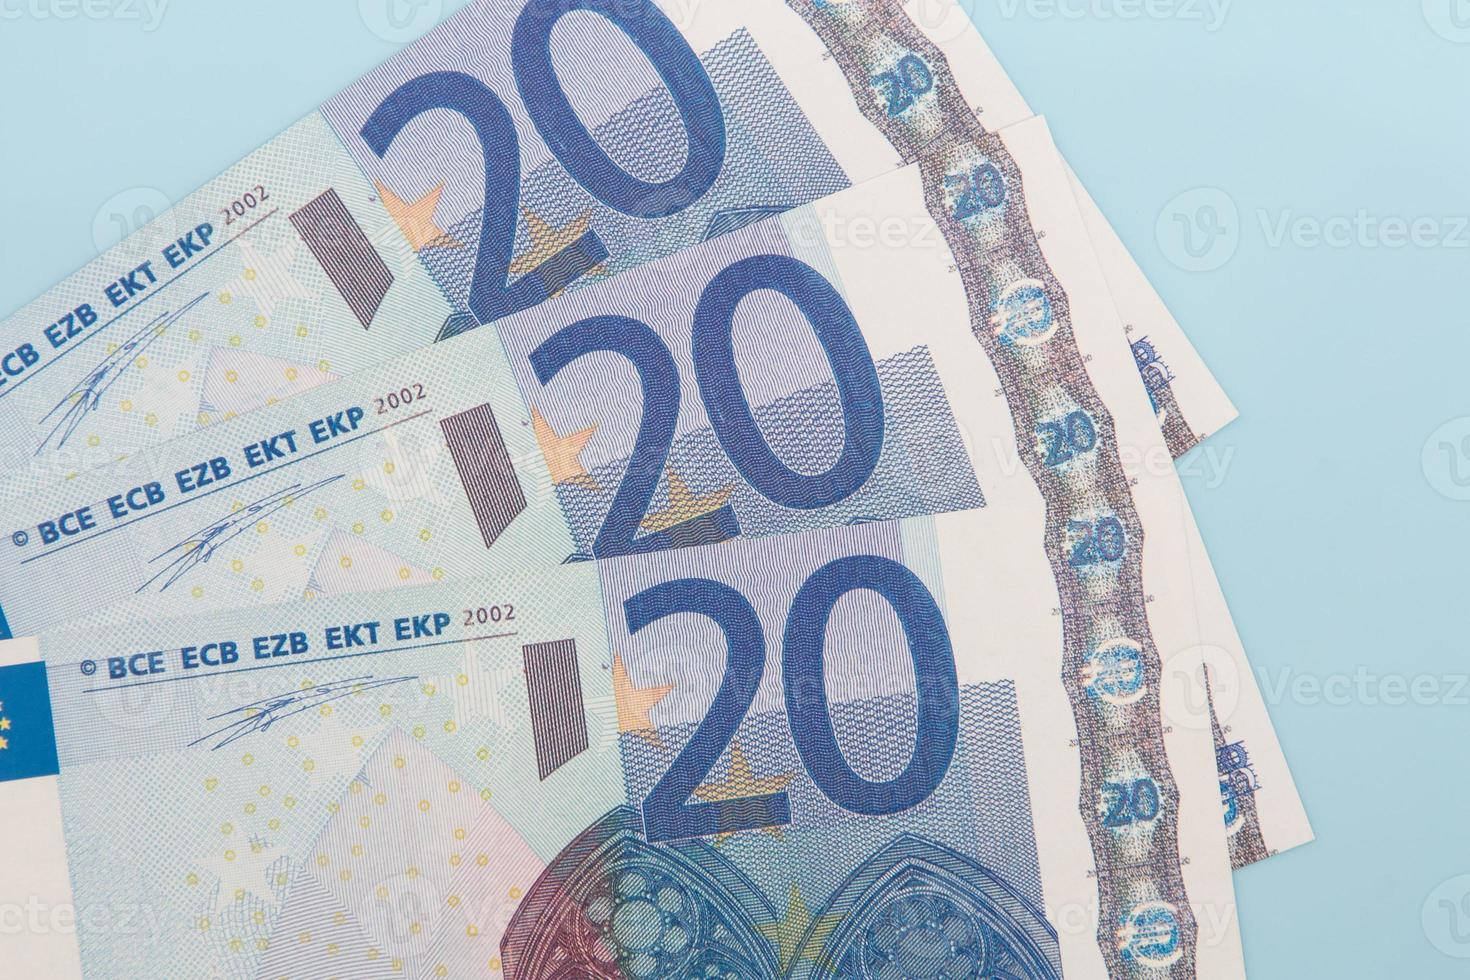 drei zwanzig Euro-Banknoten foto